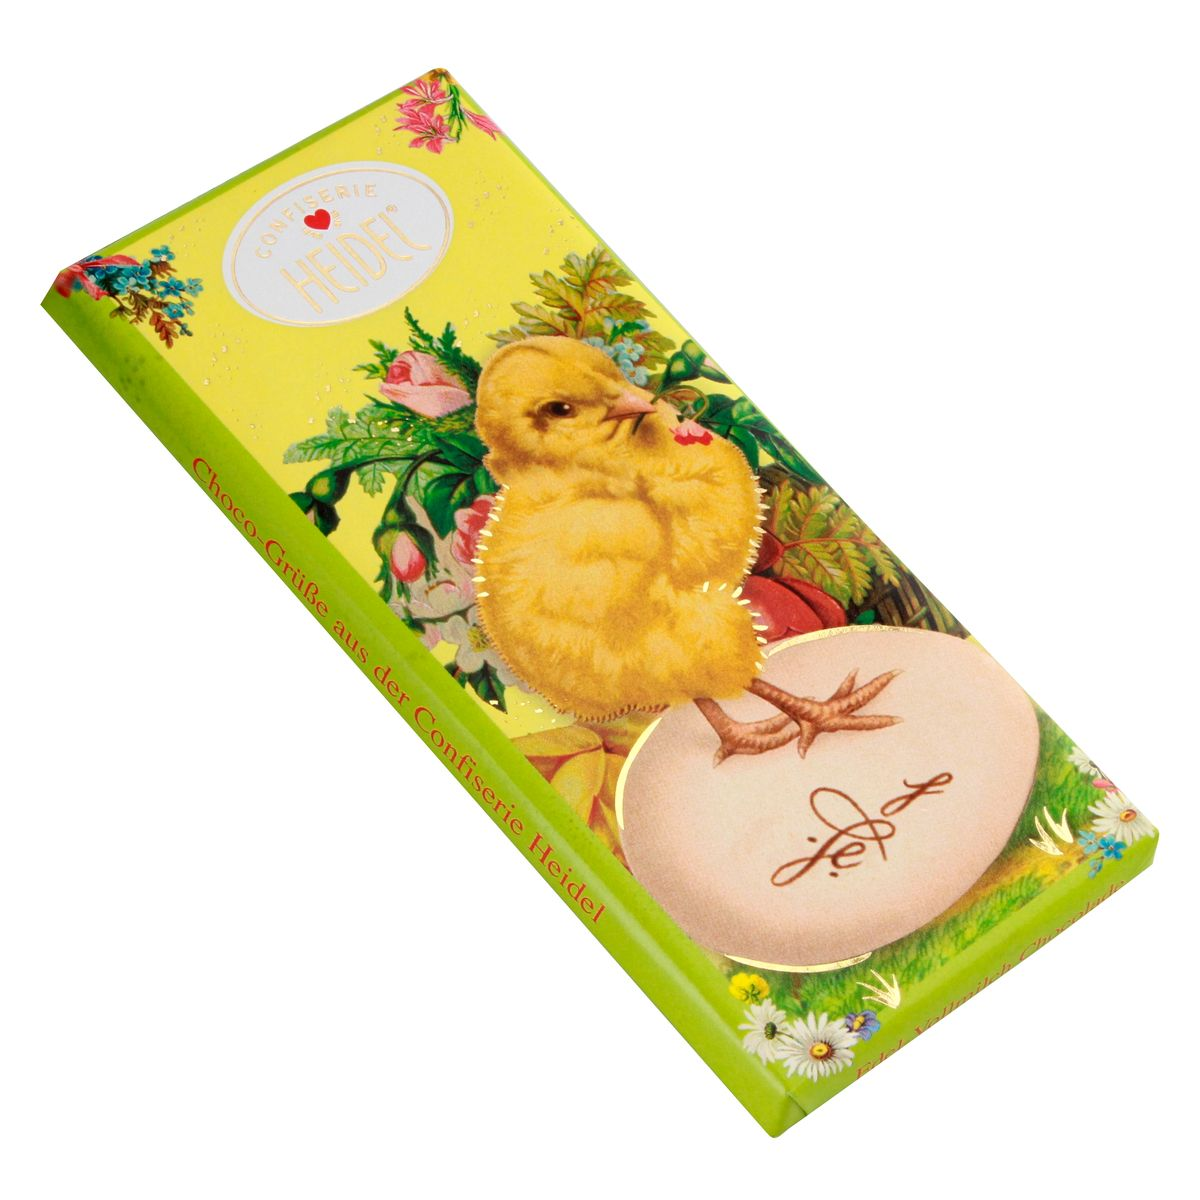 Mini-tablette cadeau nostalgie de Pâques - Heidel